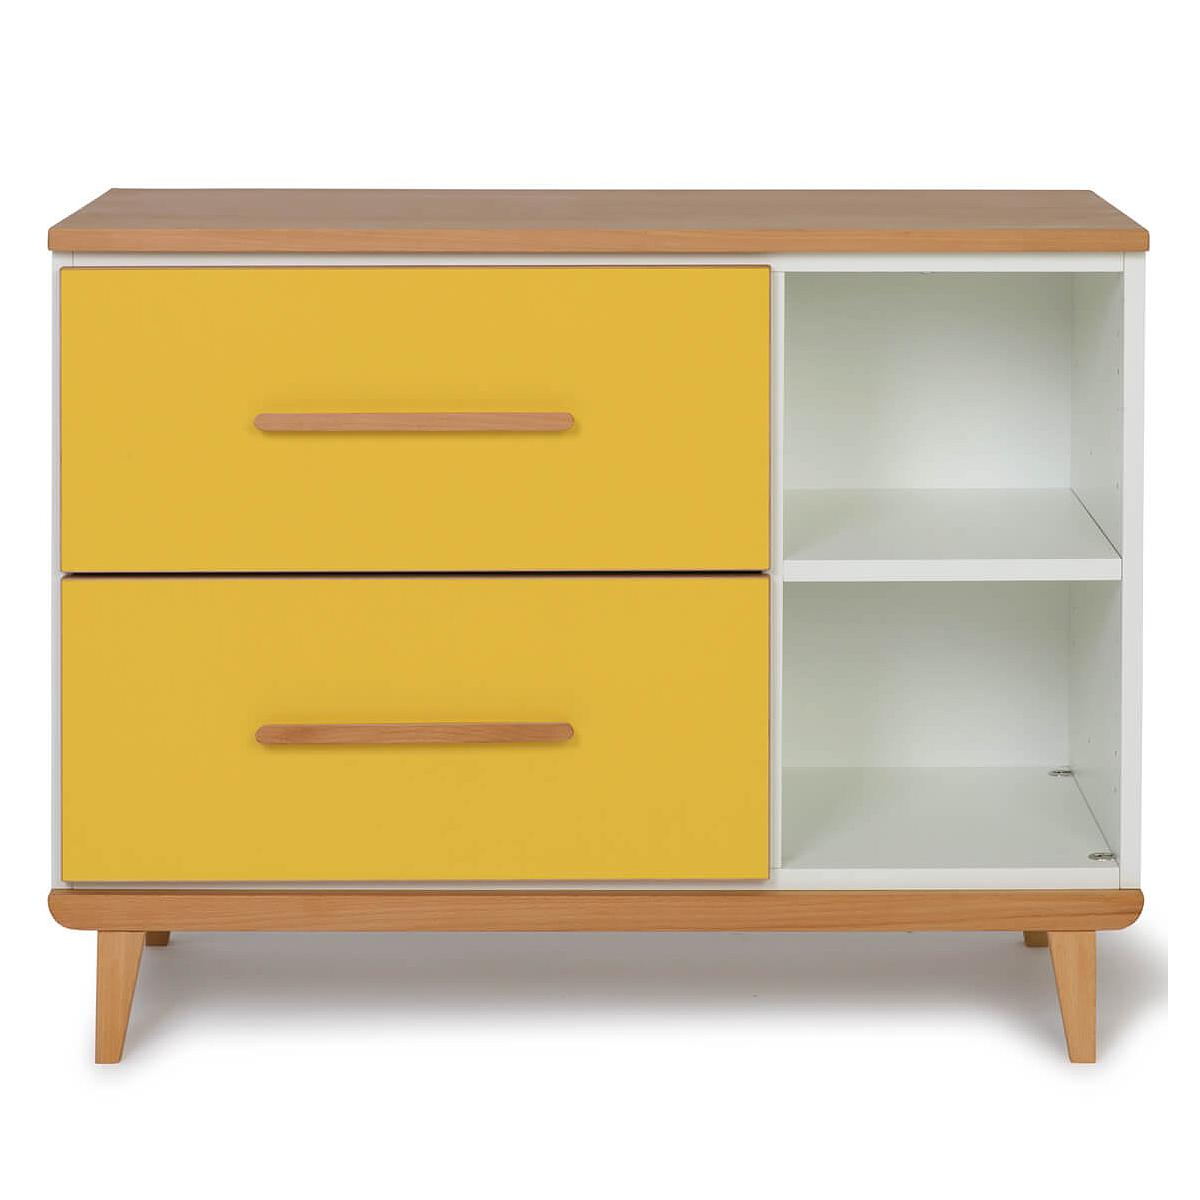 Petit meuble 2 tiroirs NADO By A.K. sunshine yellow